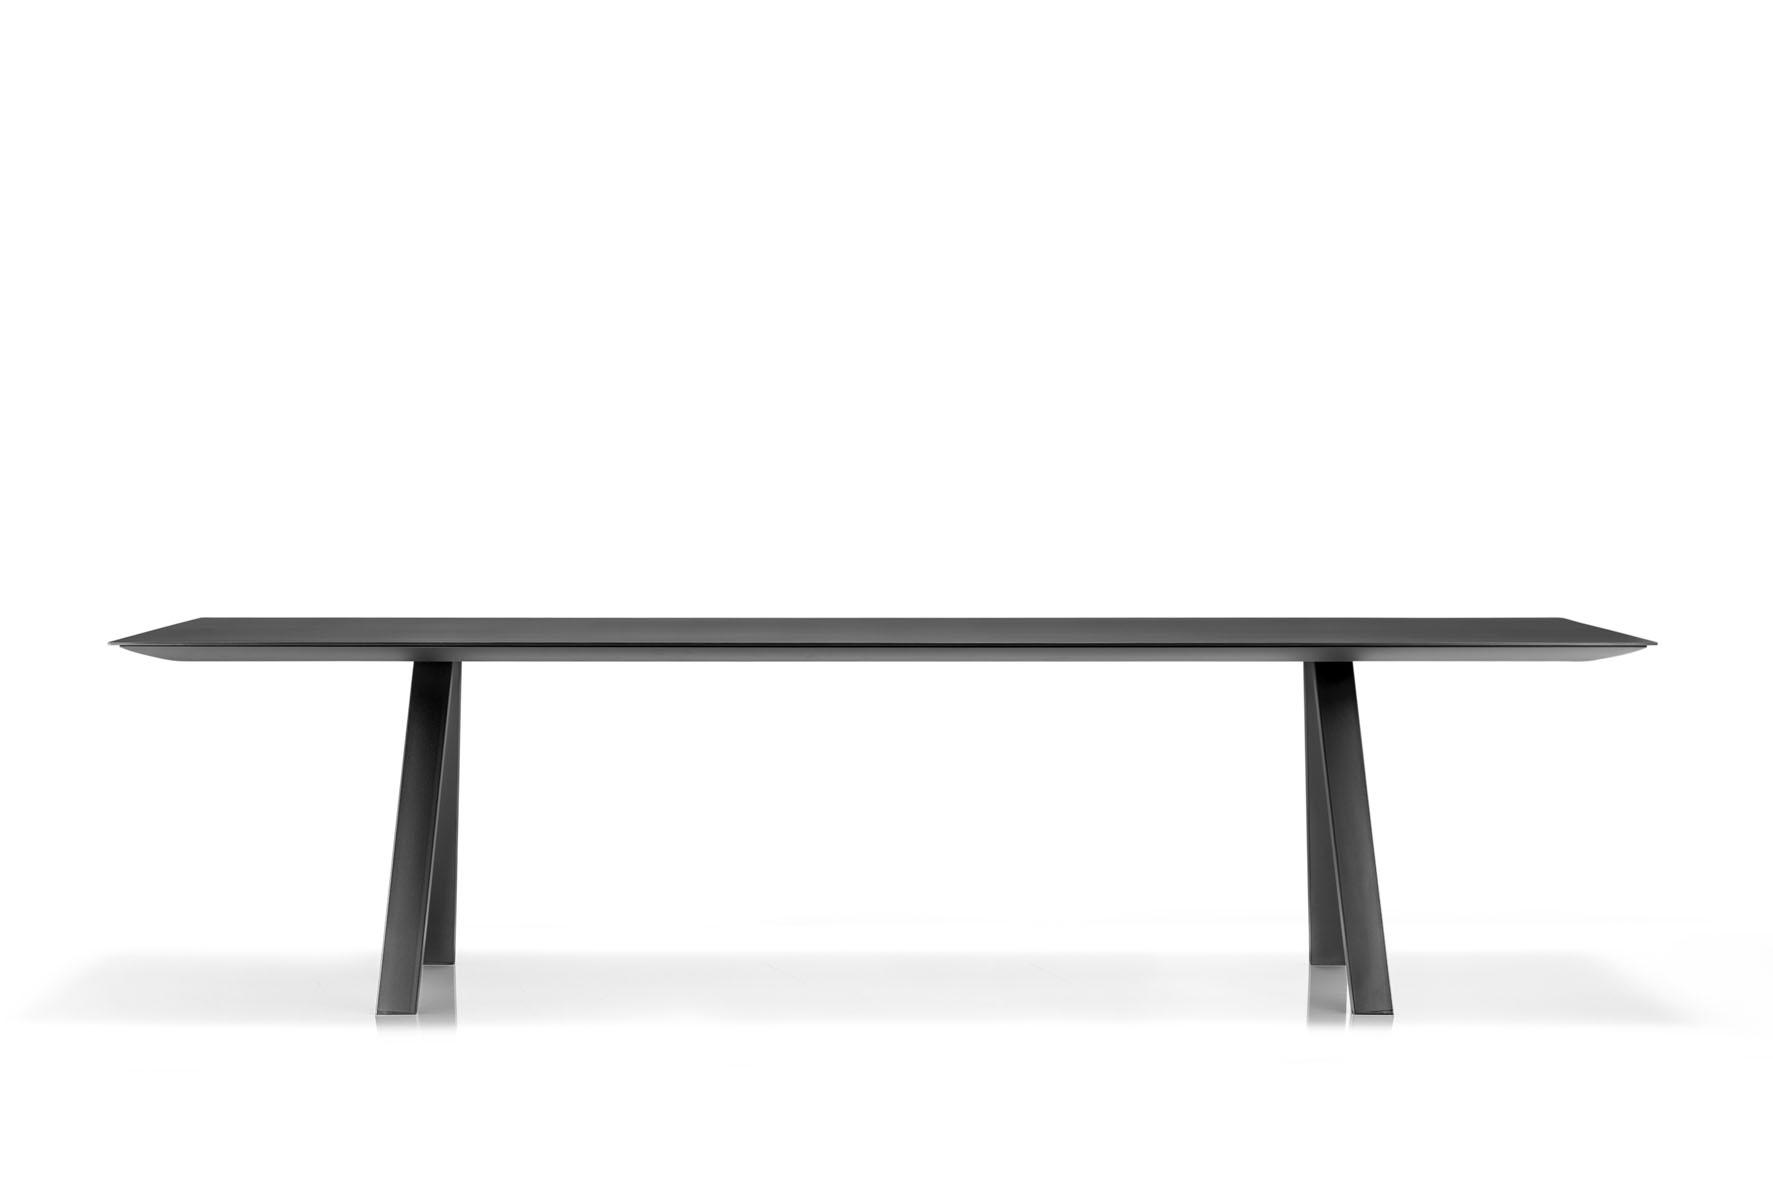 Tavoli di design Pedrali - Mobili Incardone